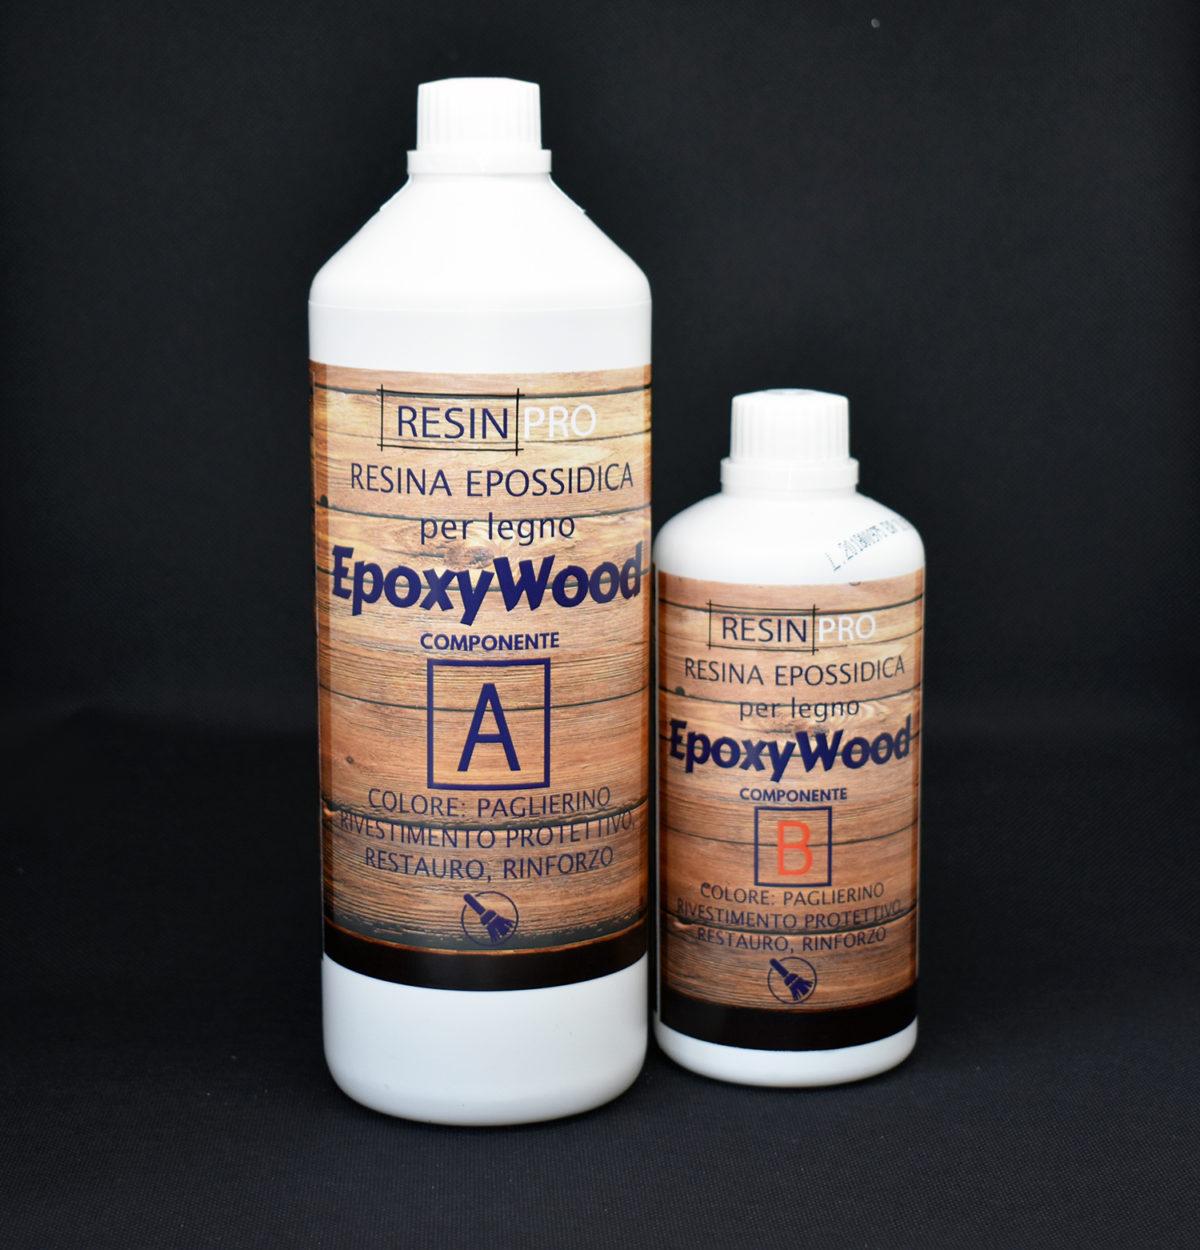 """EPOXYWOOD"" Epoxy Resin for Wood 1,5 kg [3,30 lb] - Protective coating, Restoration, Reinforcement"